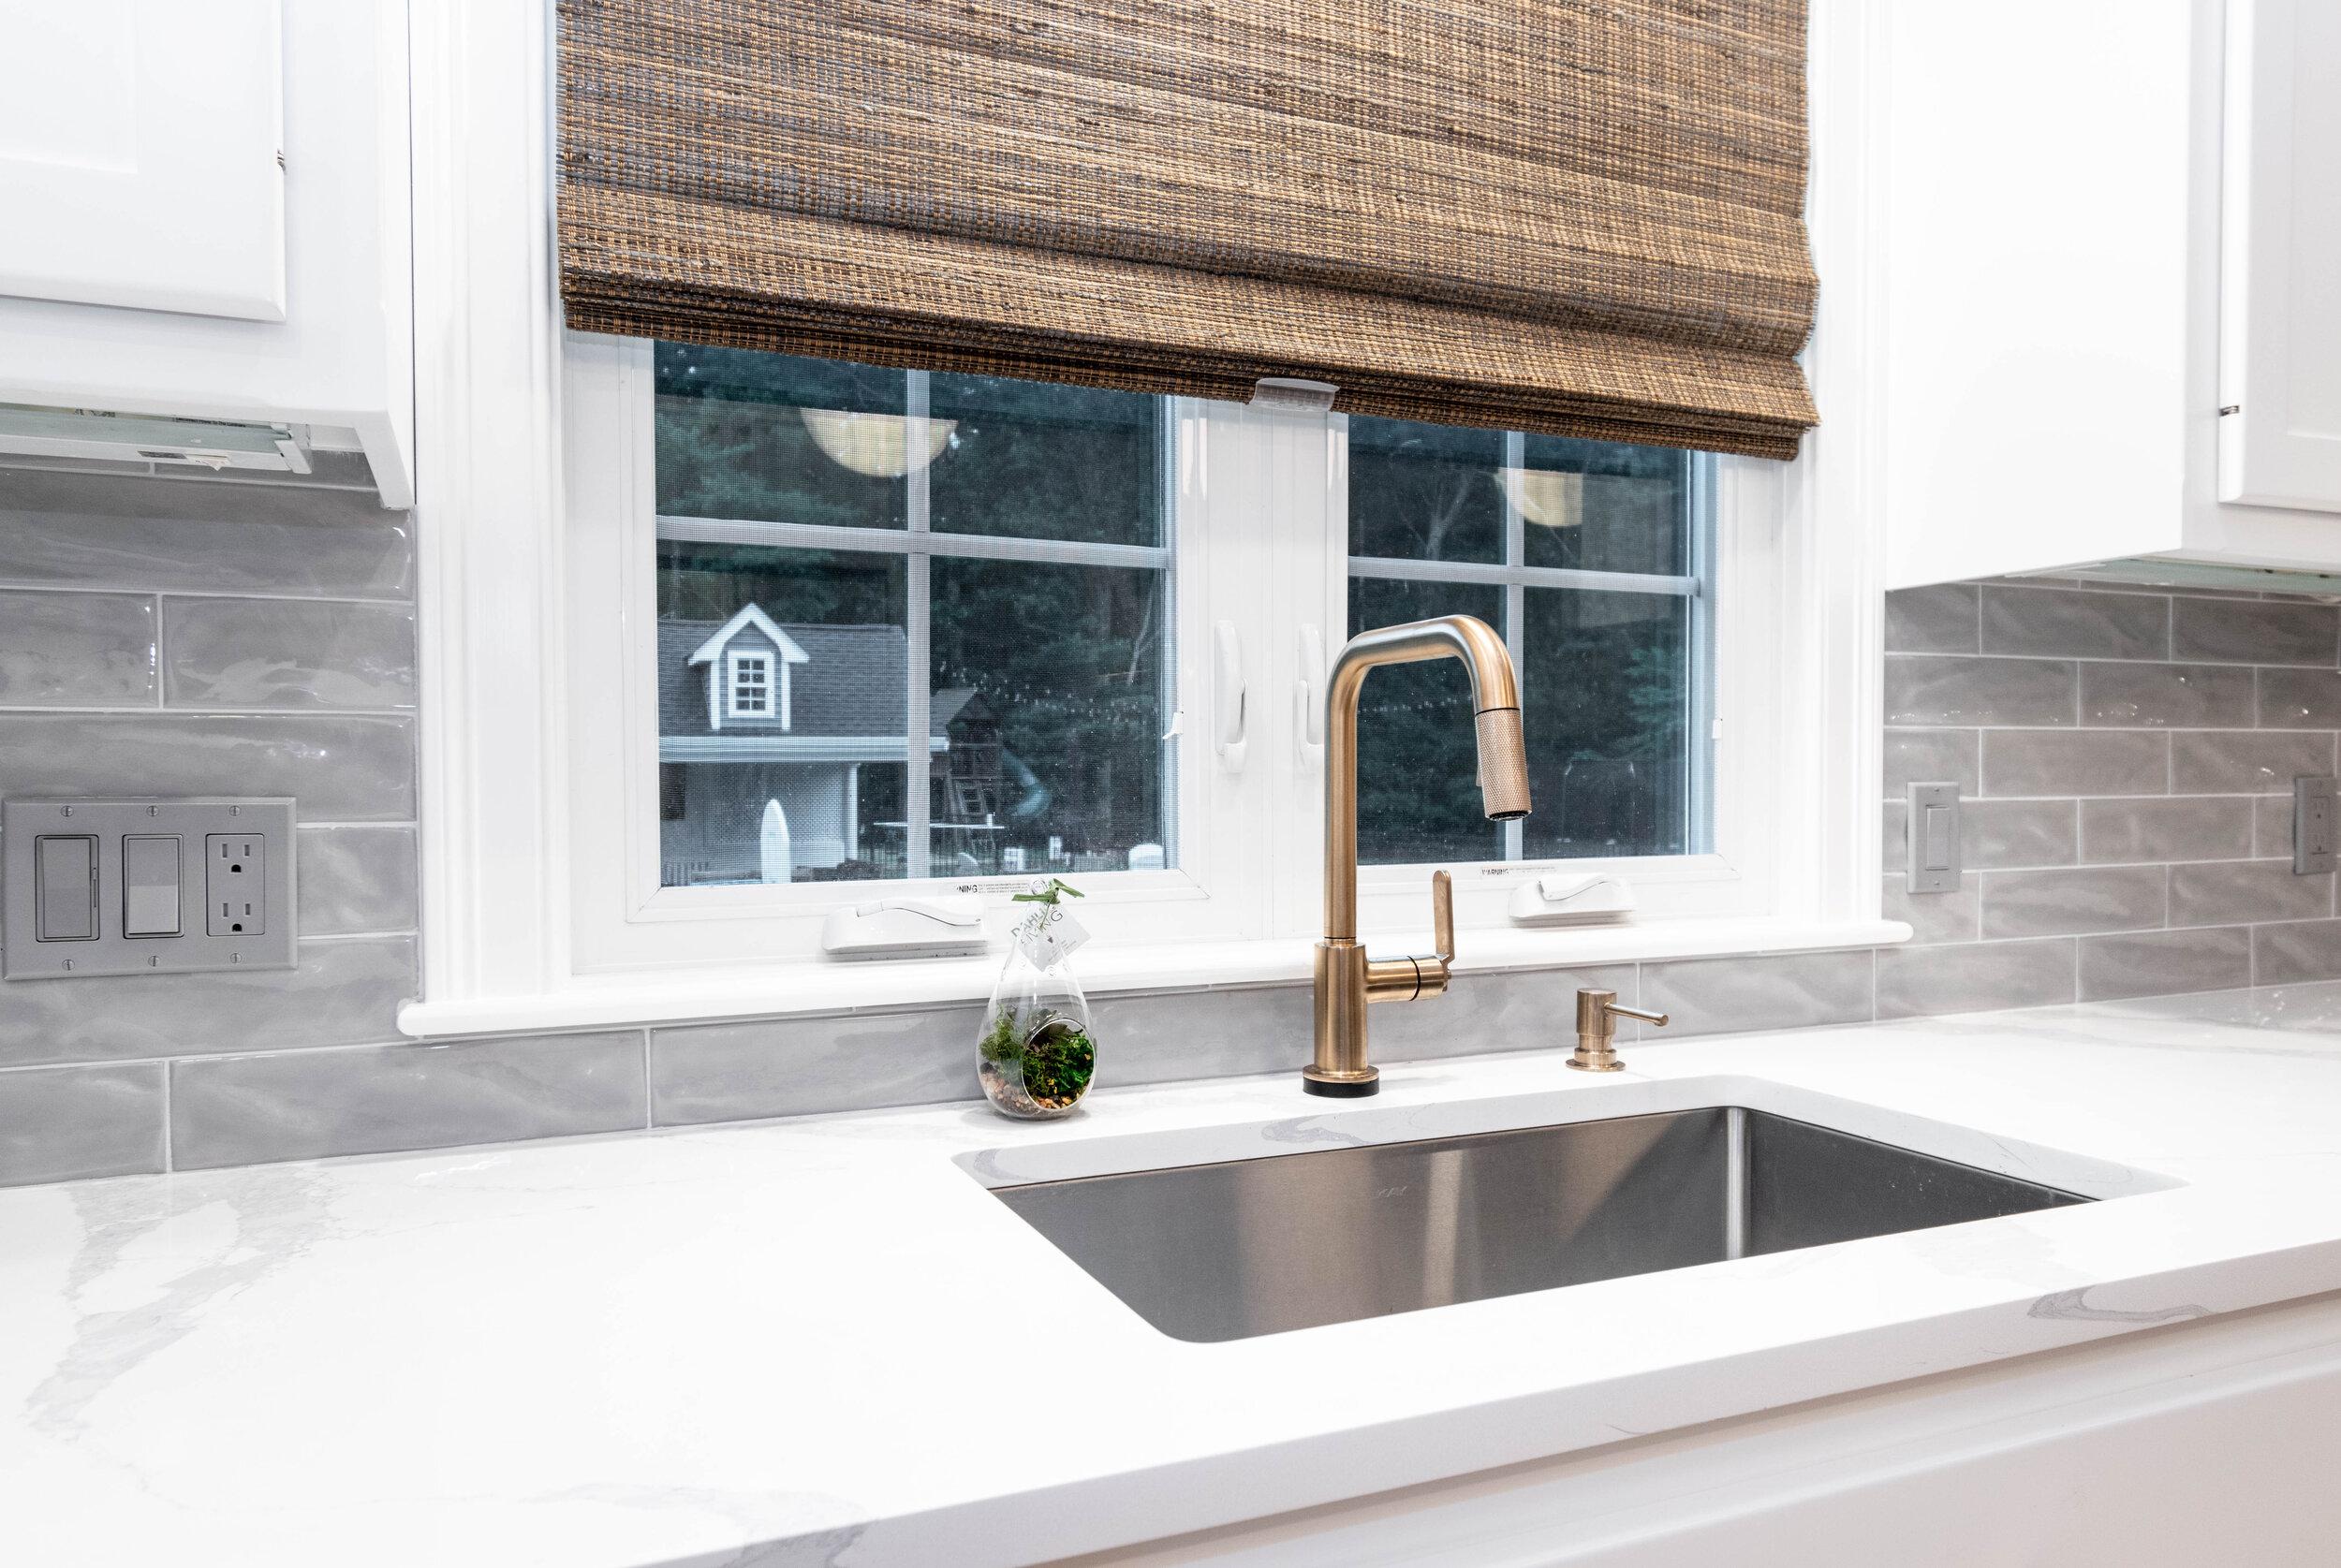 "Material: IndoQuartz Calacatta Venice  Thickness, Finish & Stone Type: 3CM Polished Quartz  Edge:  Perimeter Counters = Eased edge Island = 2 1/2"" miter  Sink: Client's sink: Under-Mount"